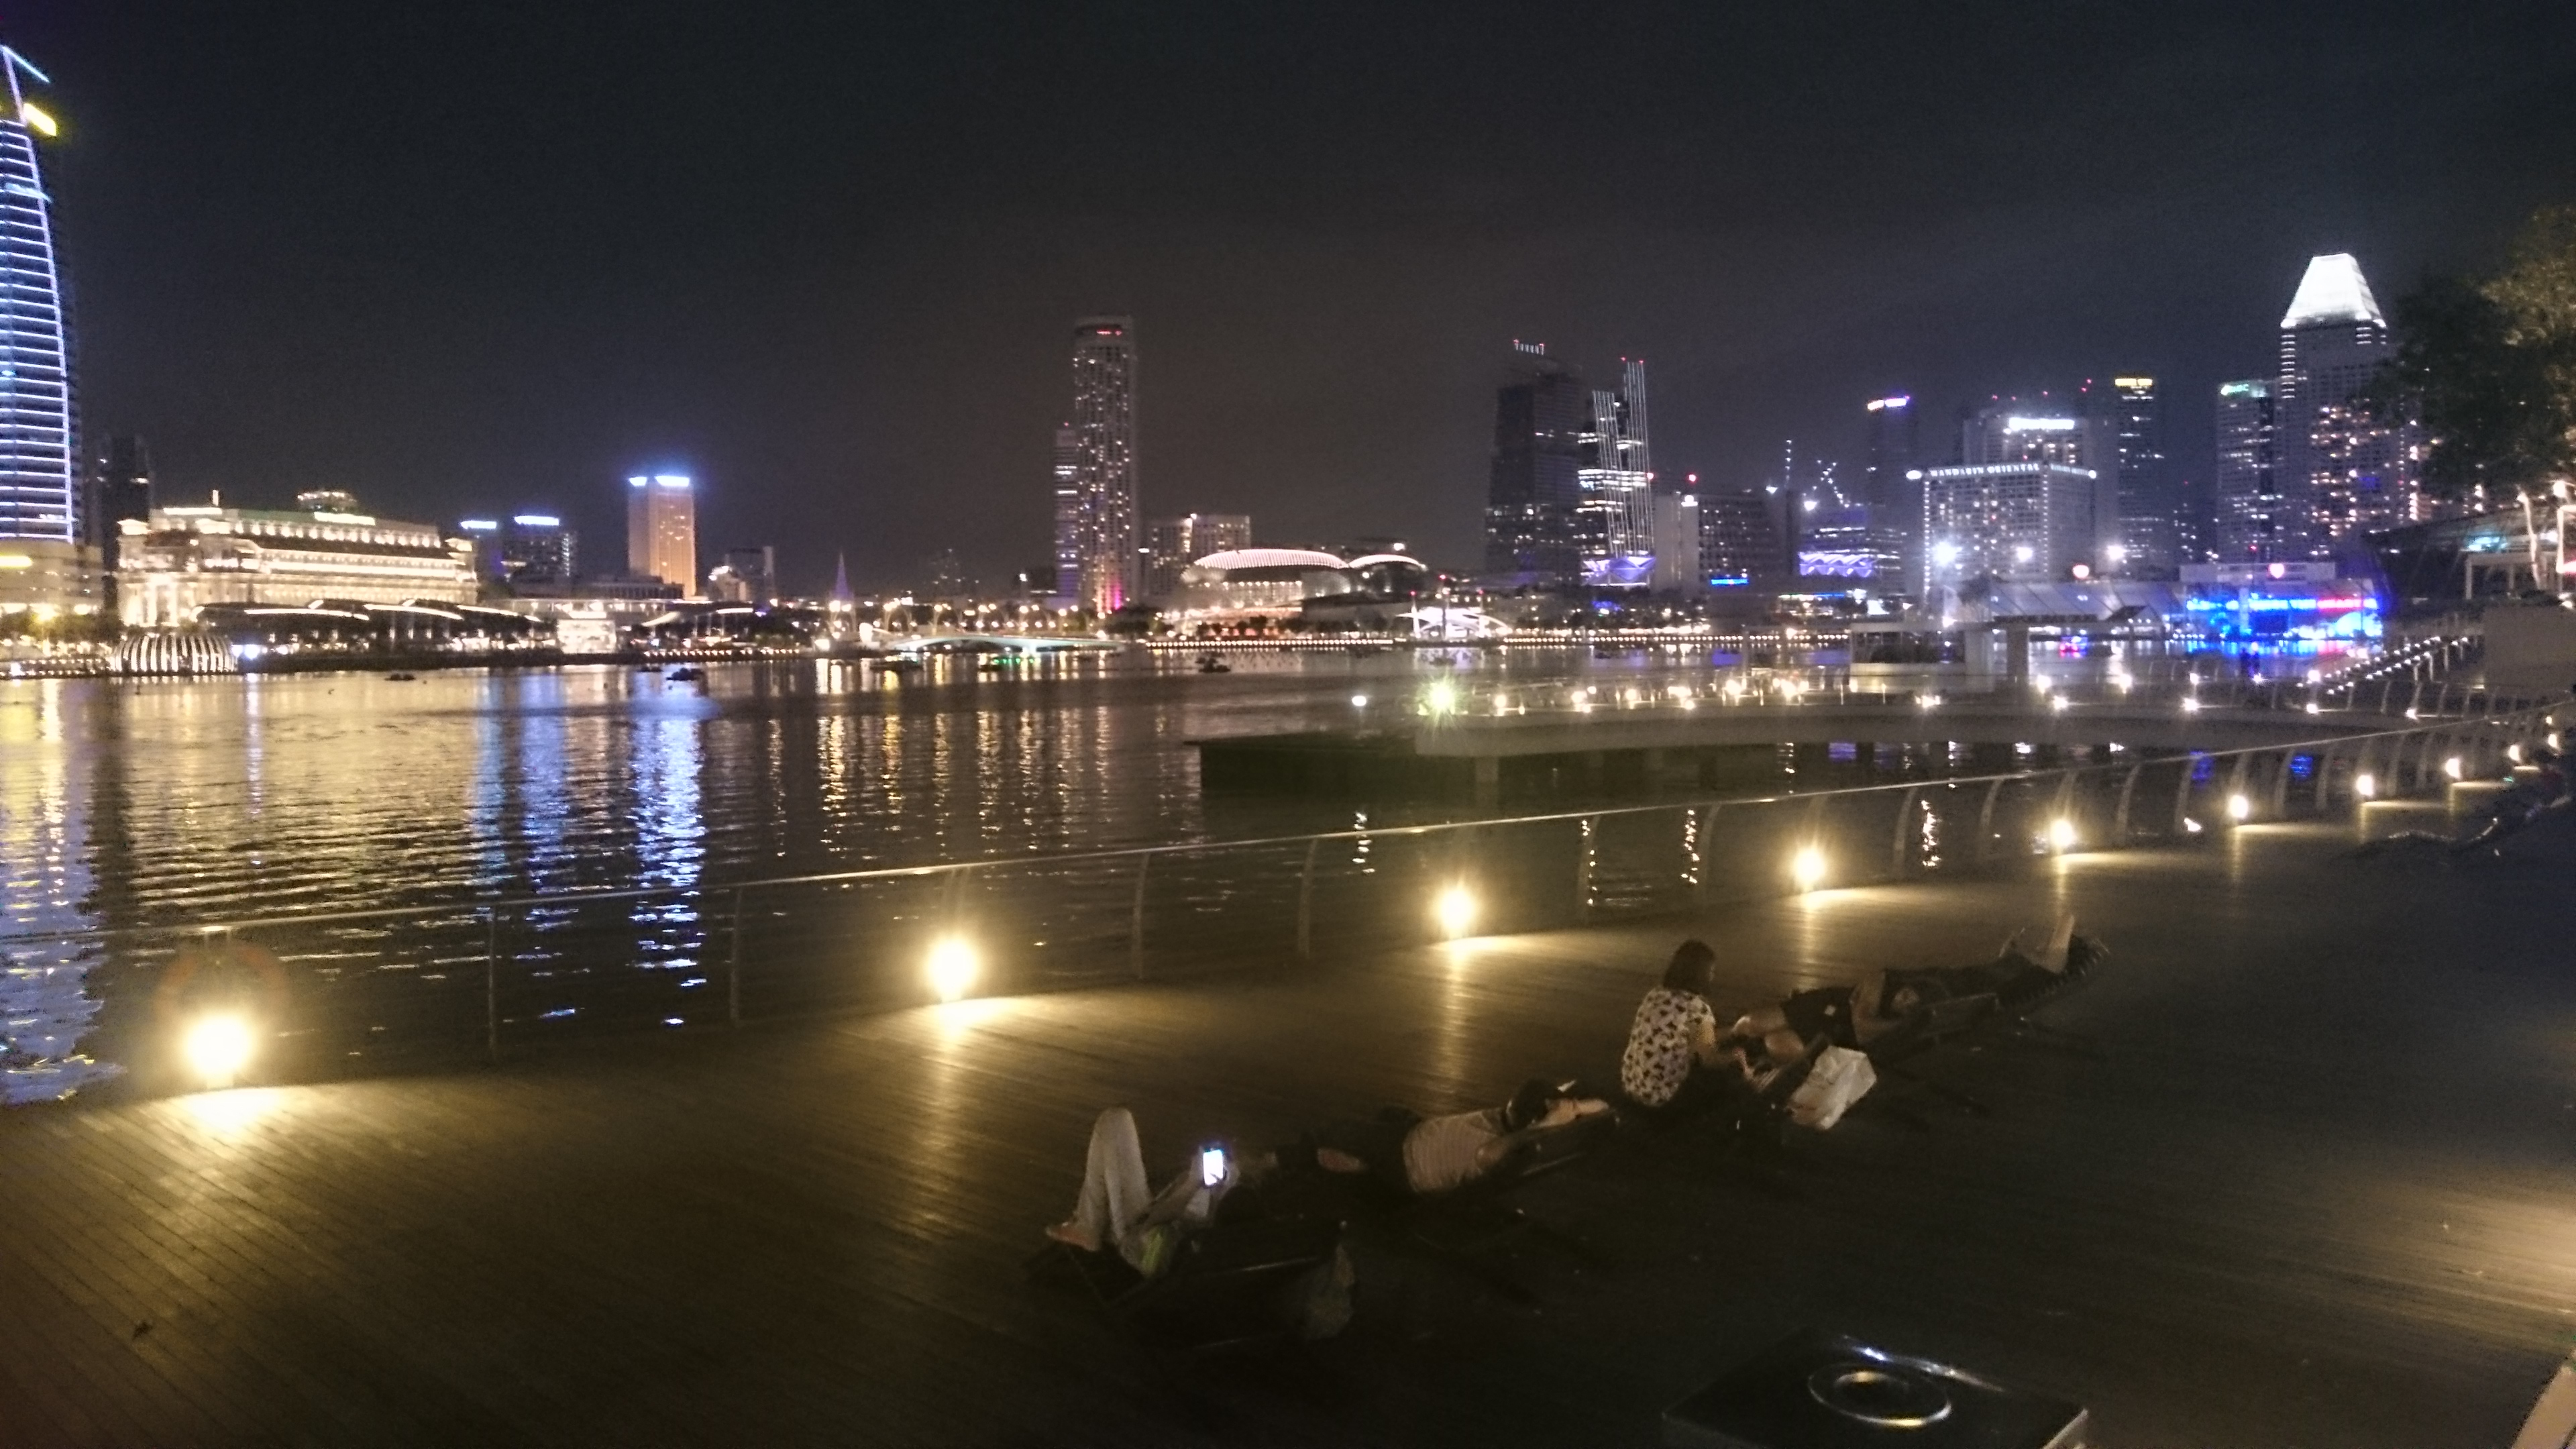 Singapore City Skyline At Night Wiring Diagrams Littelfuse Mini Addacircuit Product Details Pep Boys File 1 Wikimedia Commons Rh Org Shanghai